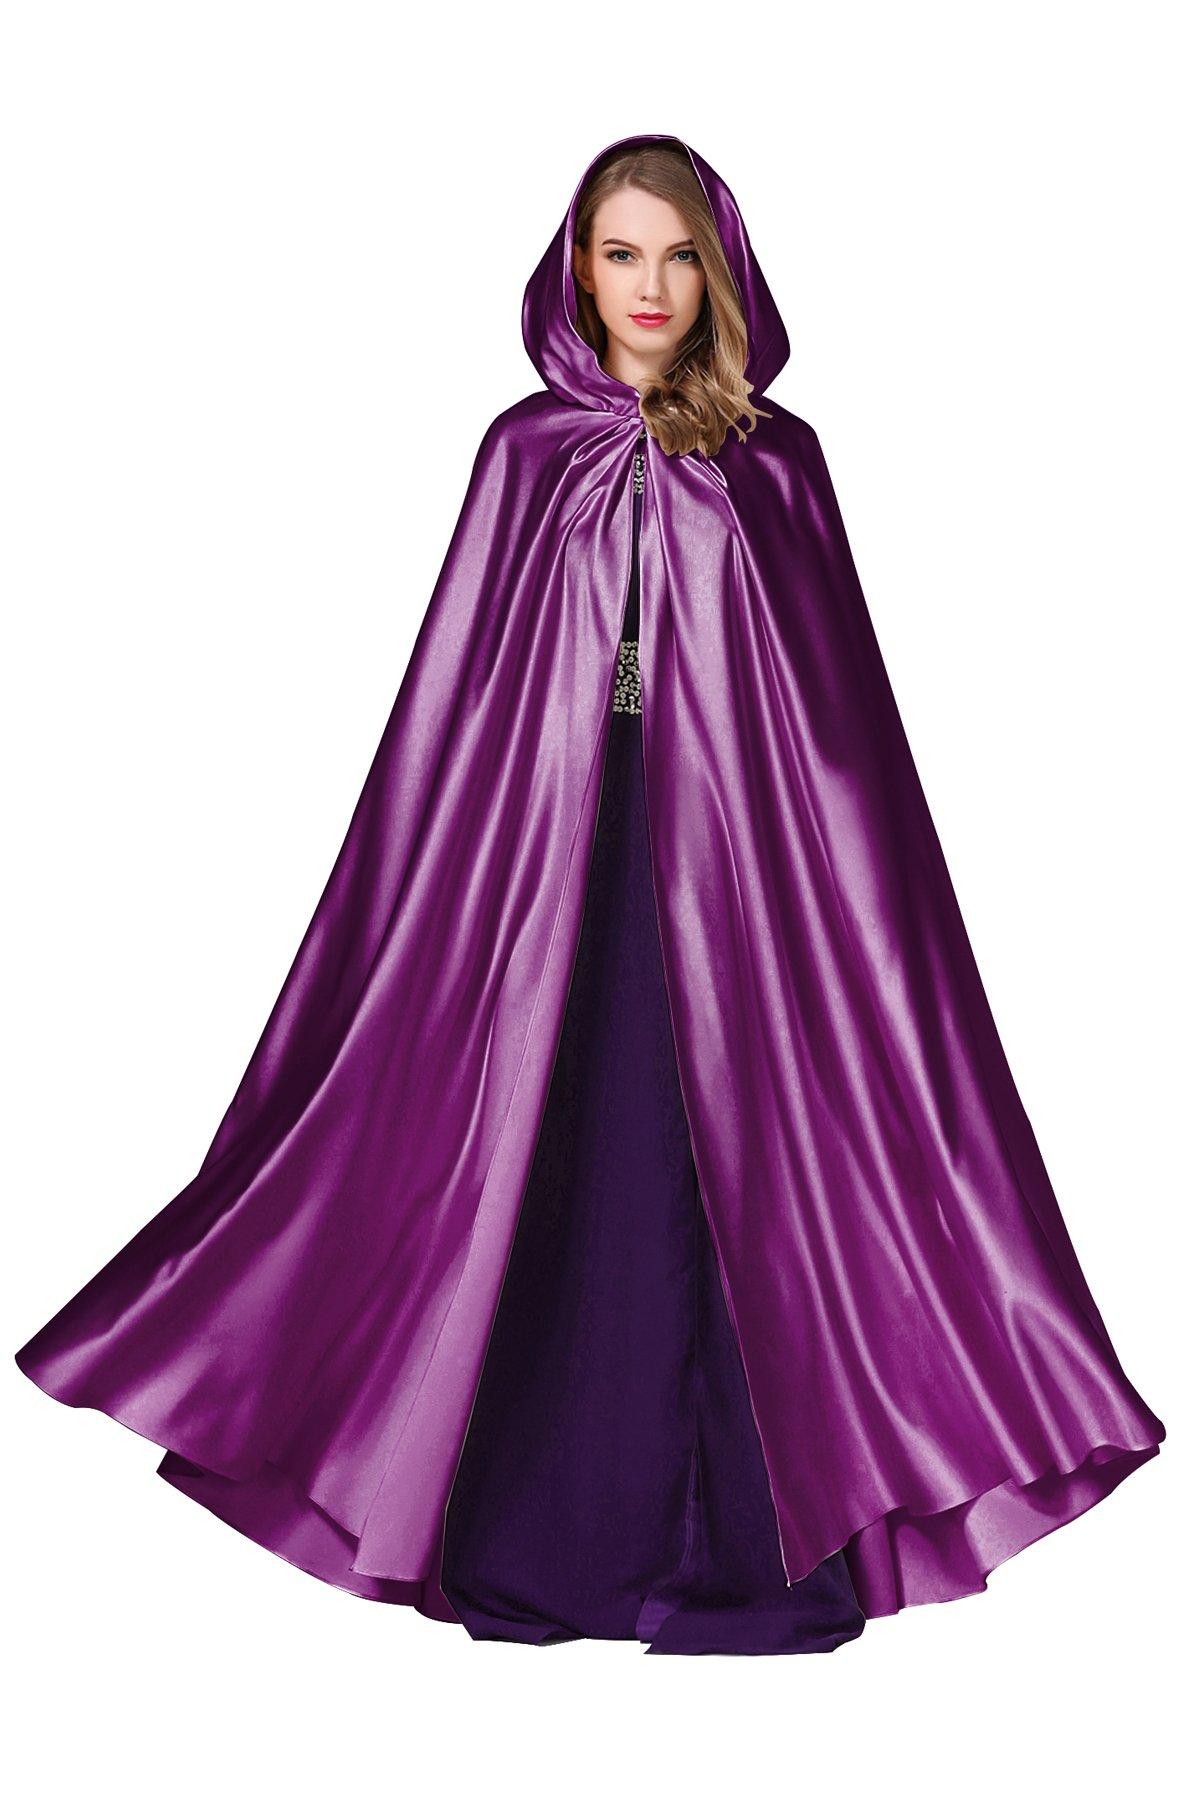 BEAUTELICATE Womens Wedding Hooded Cape Bridal Cloak Poncho Full Length More Colors